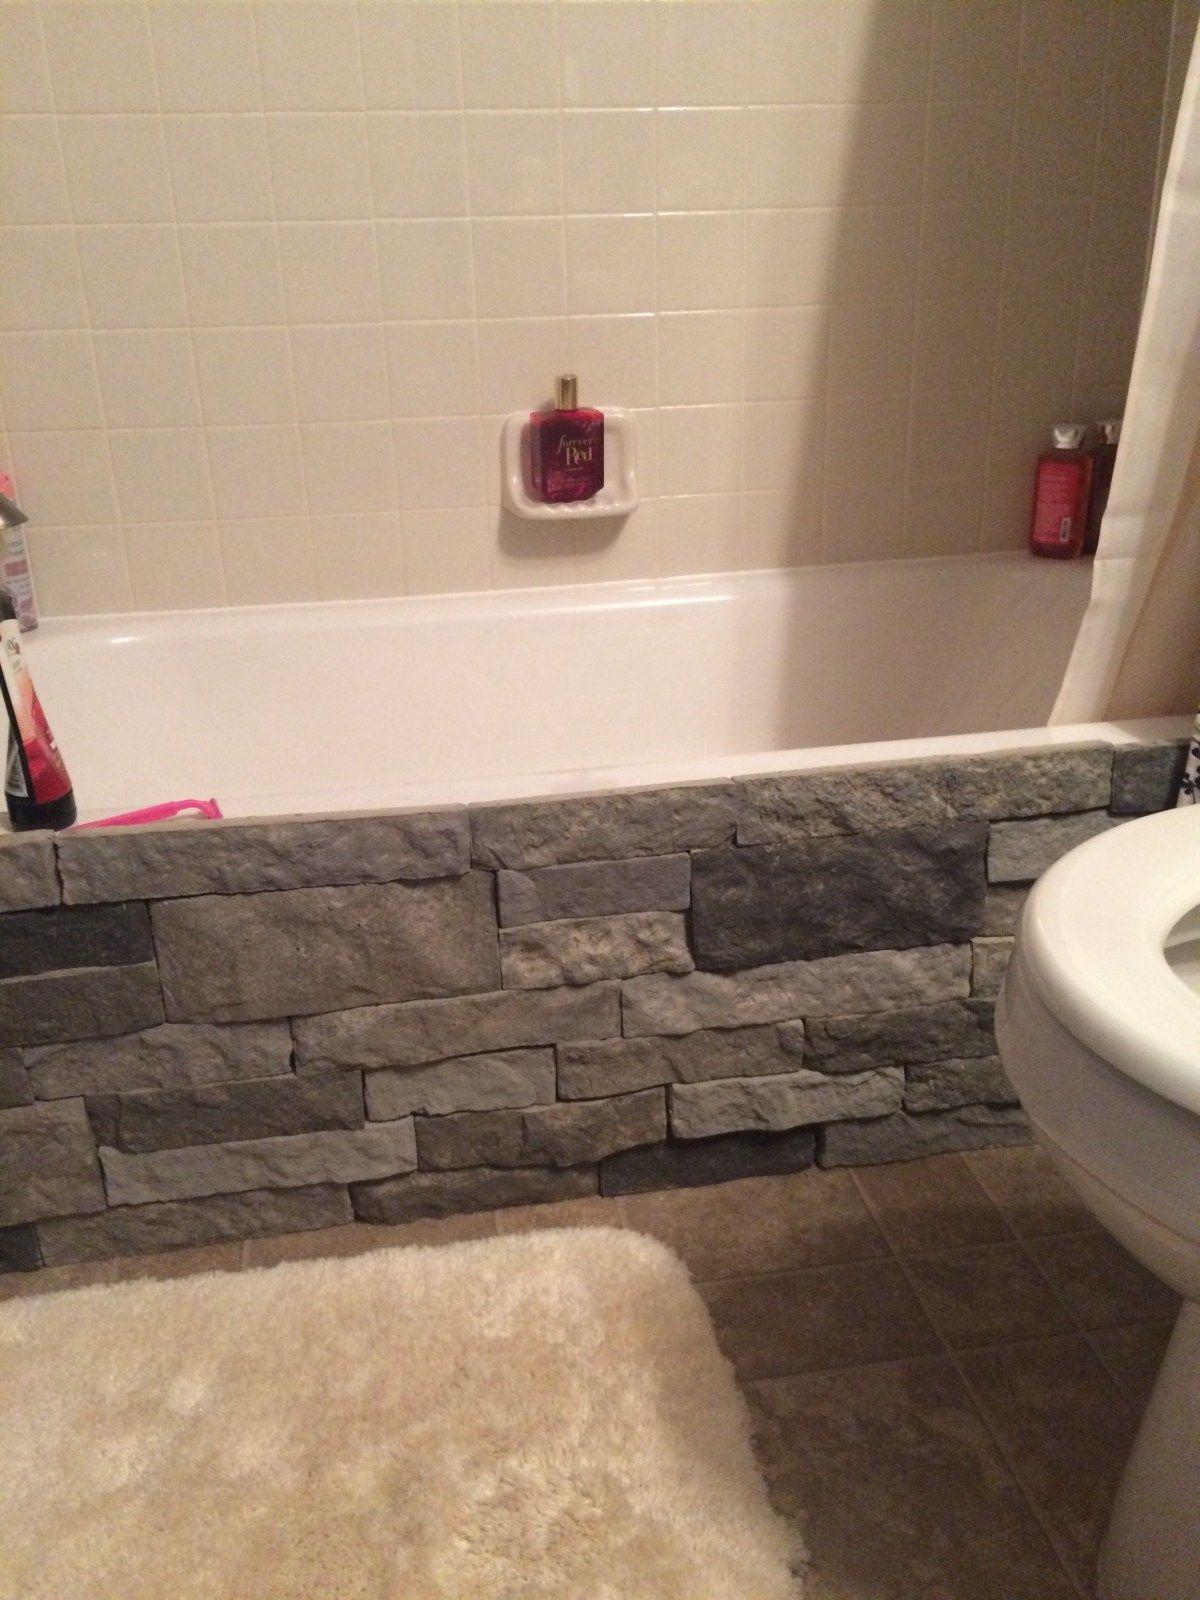 vinyl wall covering for bathrooms  bathtub makeover diy